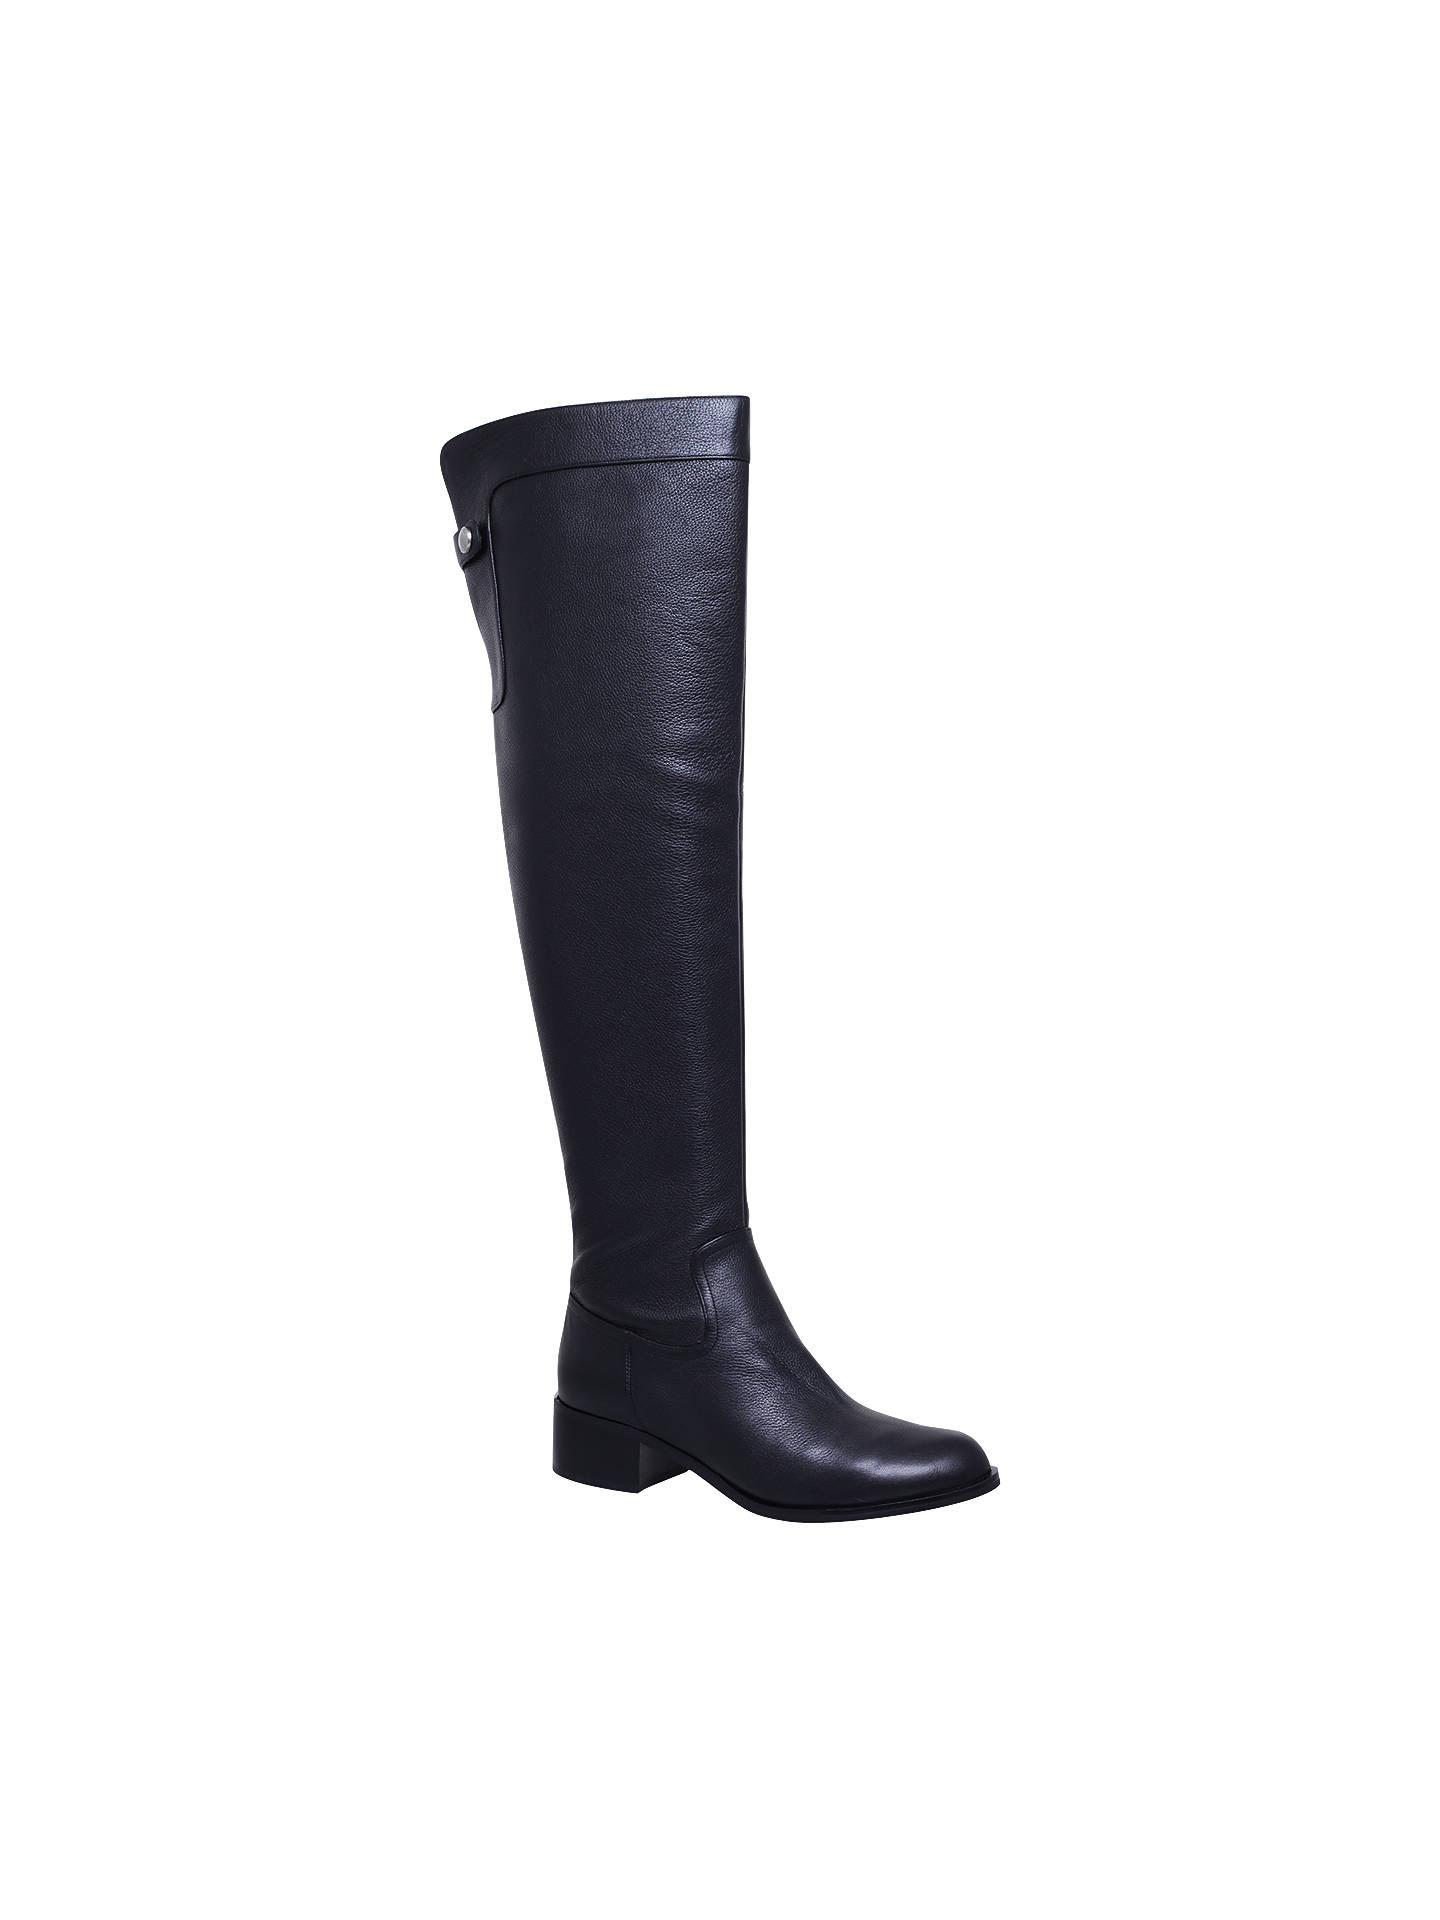 6c27785b371 Buy MICHAEL Michael Kors Over the Knee Boots